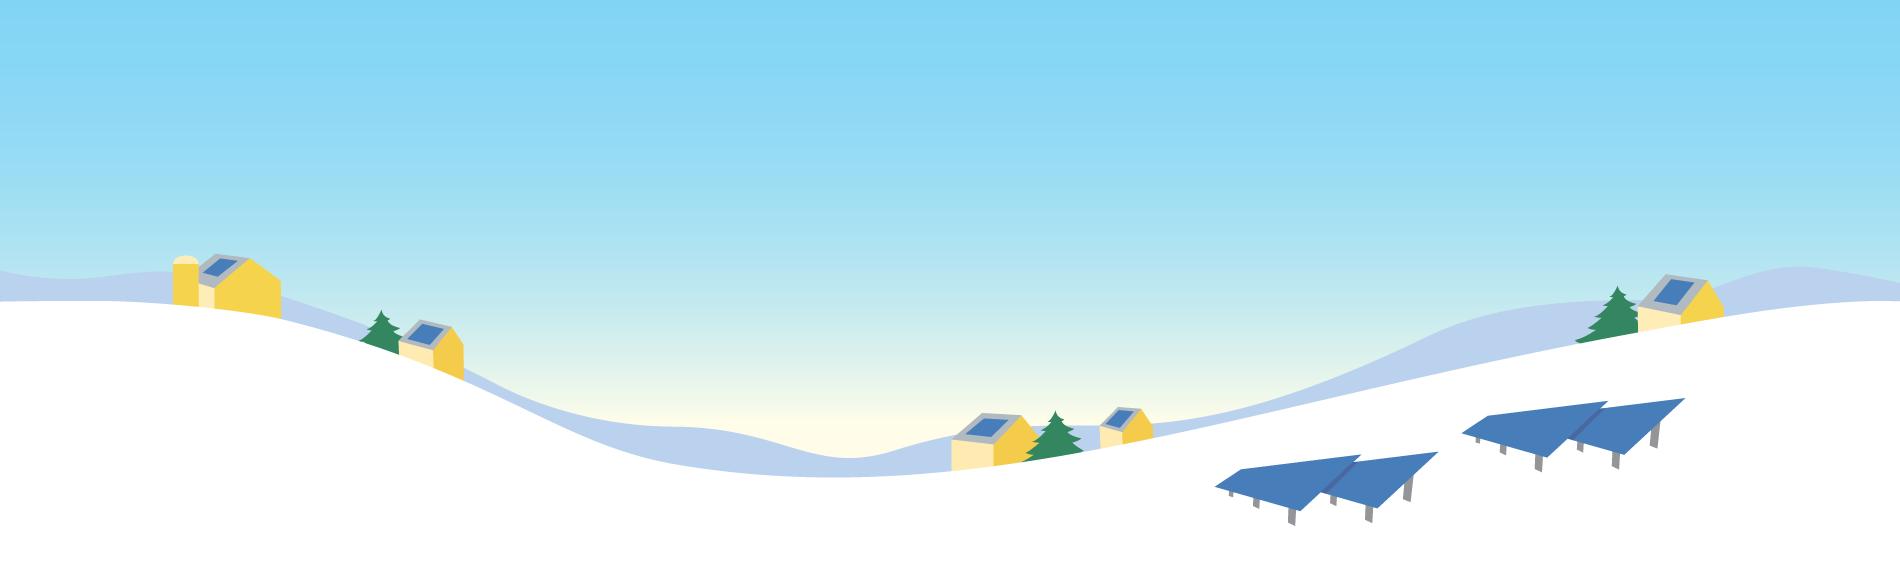 Solar in Winter Background